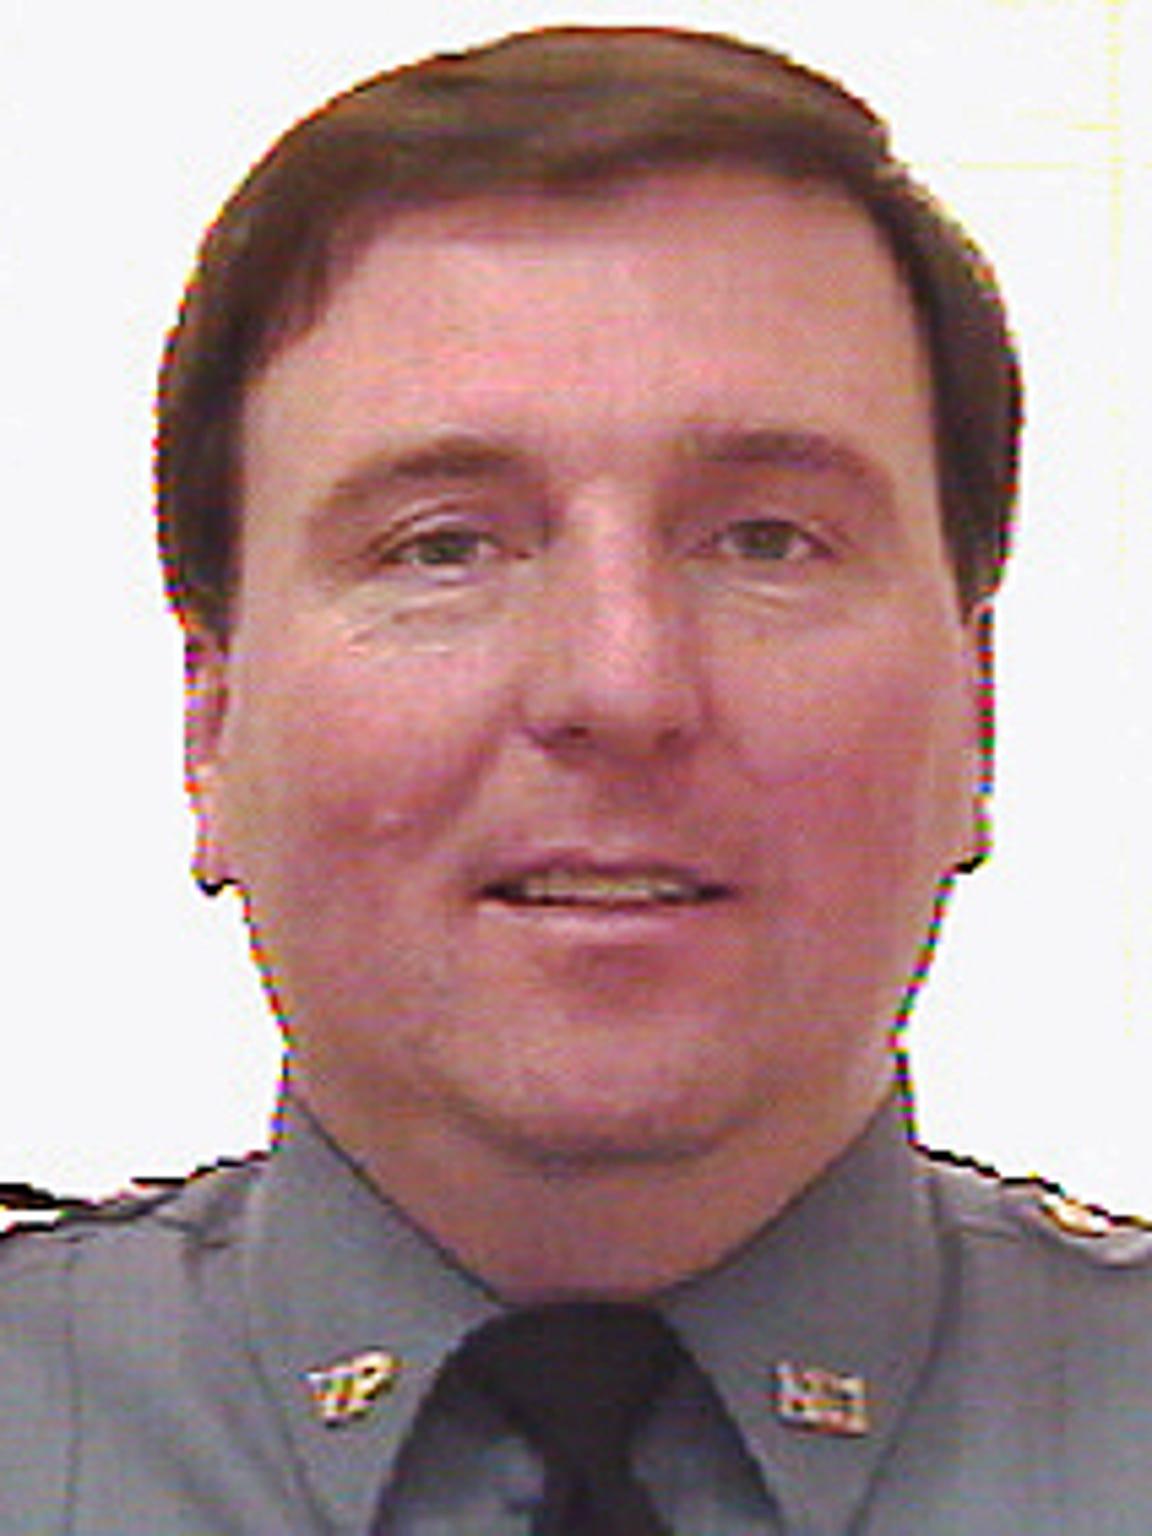 Former Voorhees Police Chief Keith Hummel was accused